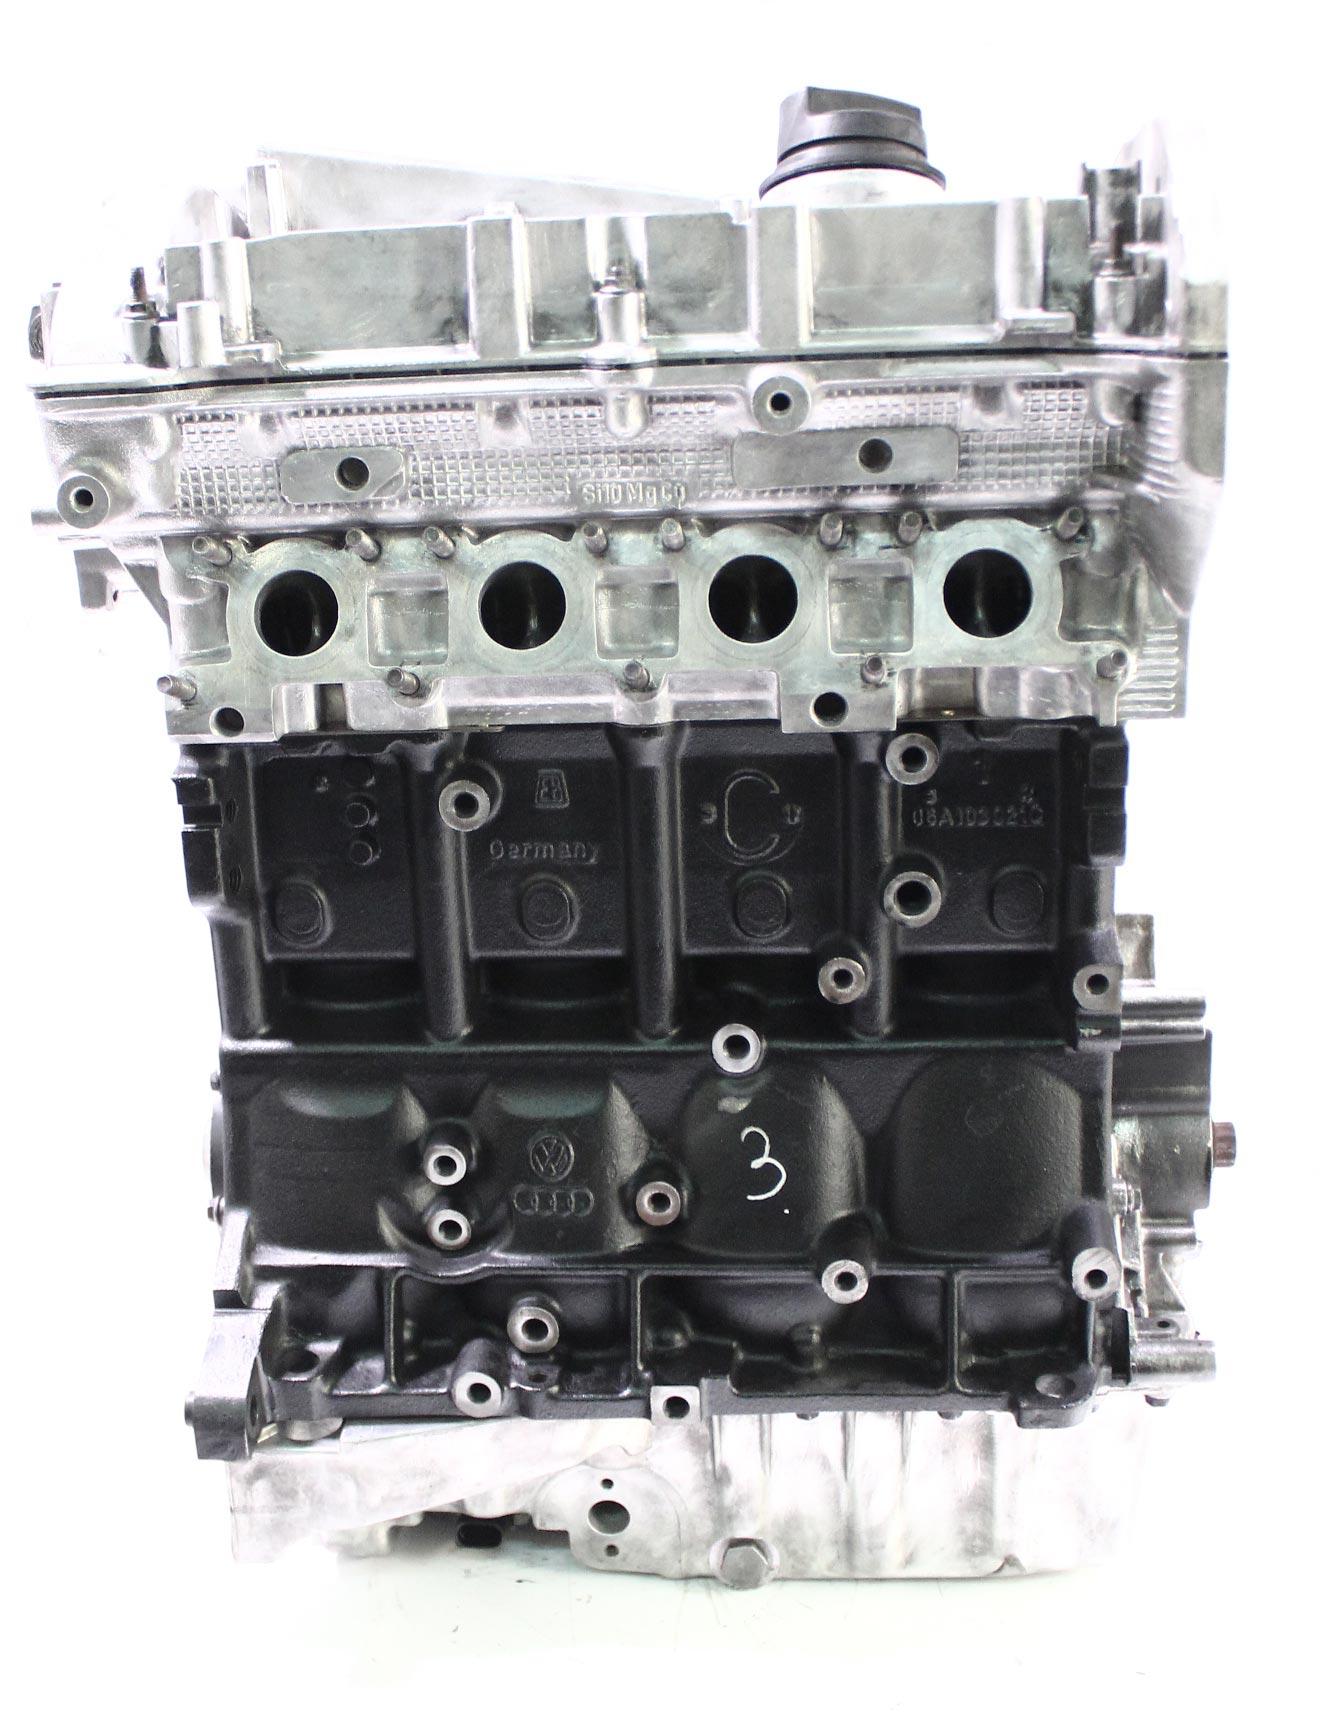 Motor 2003 Seat Audi 1,8 T ARY 180 PS Kopf geplant Dichtungen NEU